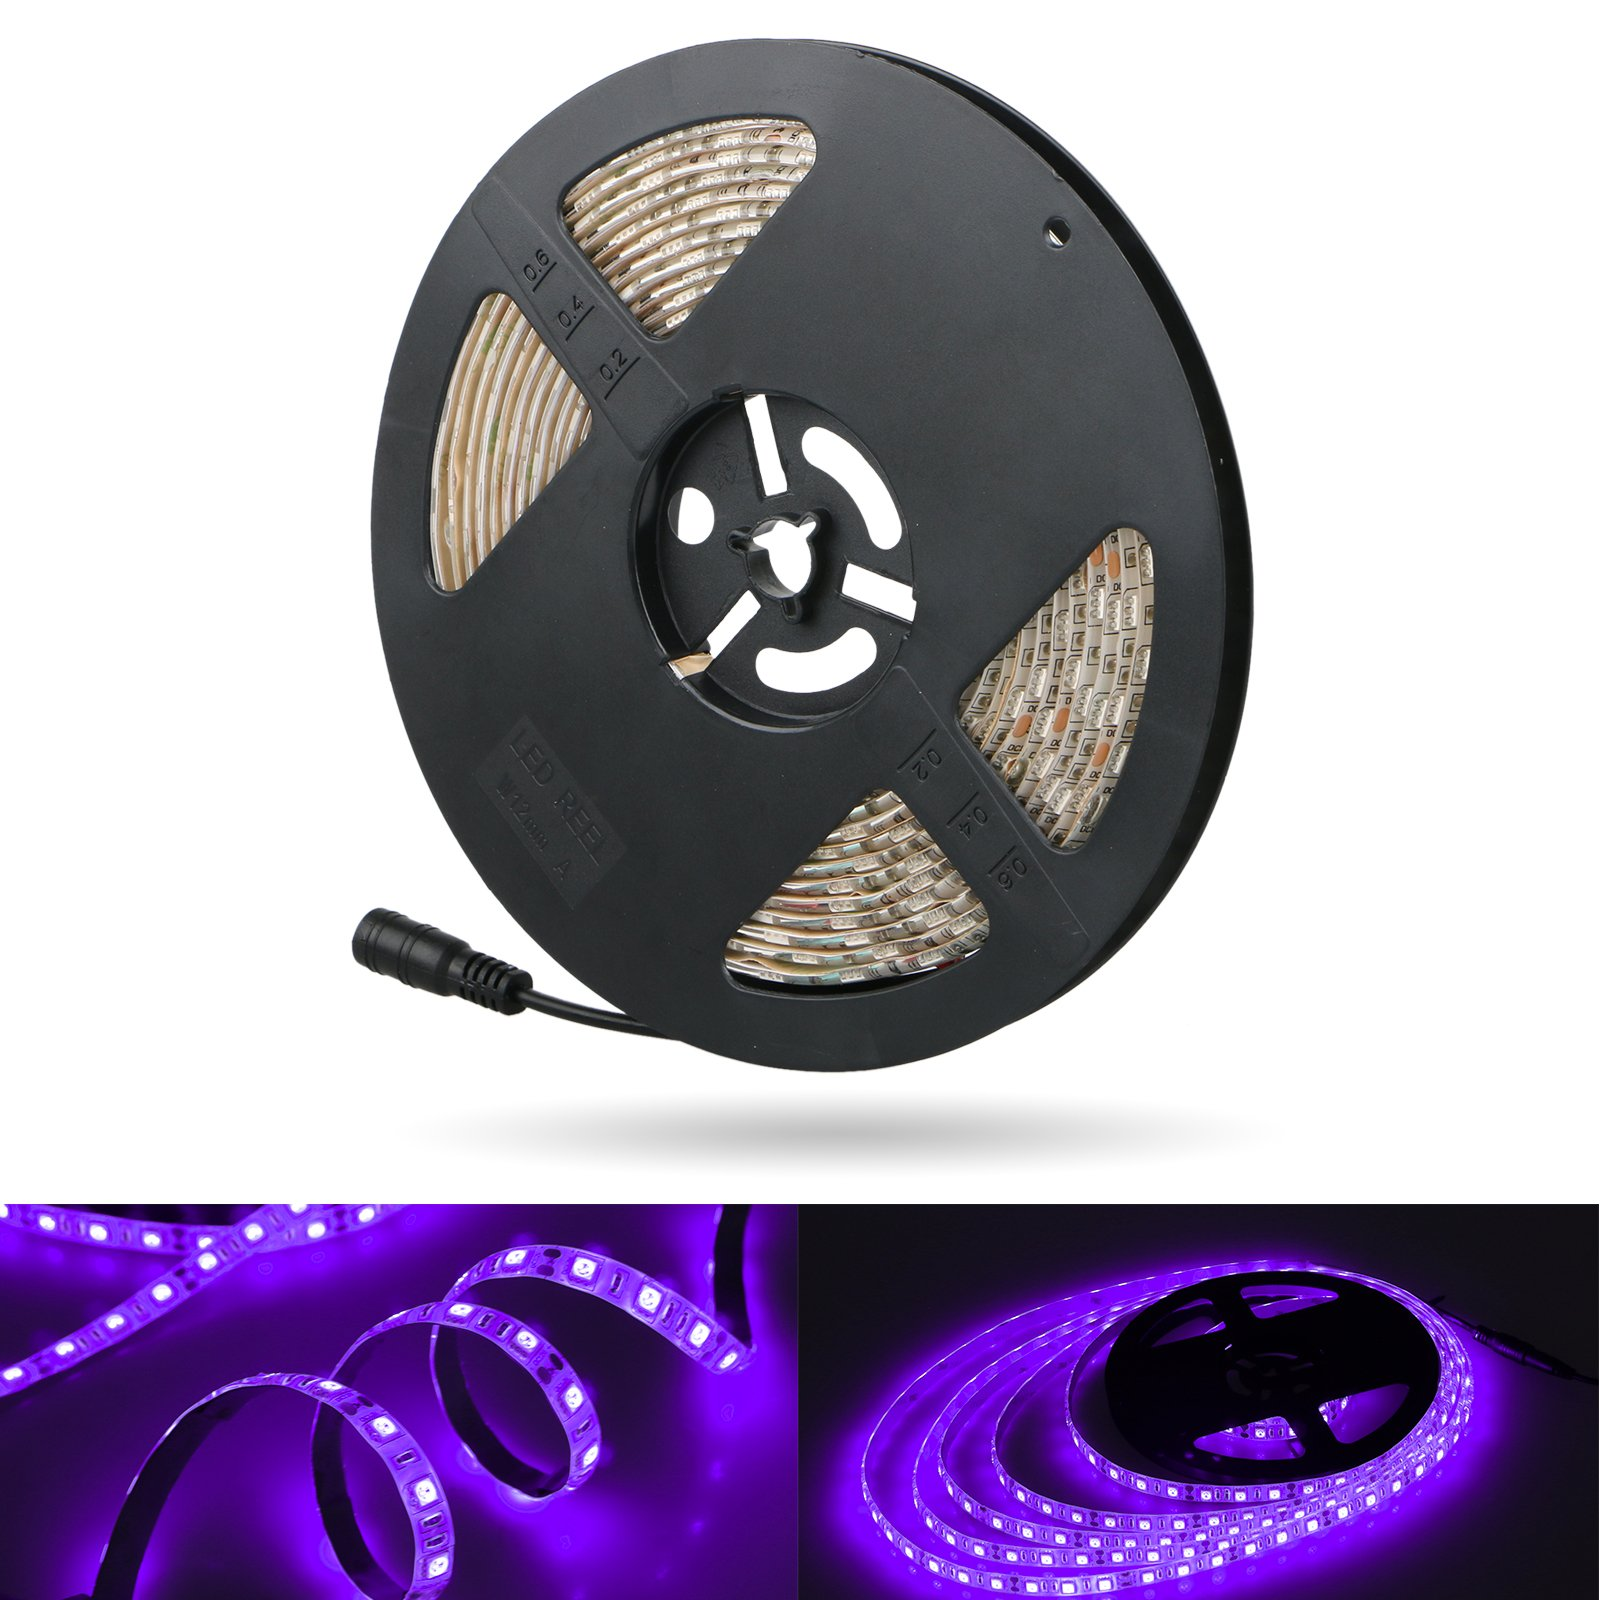 LinkStyle UV Black Lights LED Strip, 16.4Ft 300 LEDs 5050 SMD Ultraviolet Light UV LED Strip Light, Flexible & IP65 Waterproof DC 12V Purple Light Night Fishing(Power Adapter Not Included)